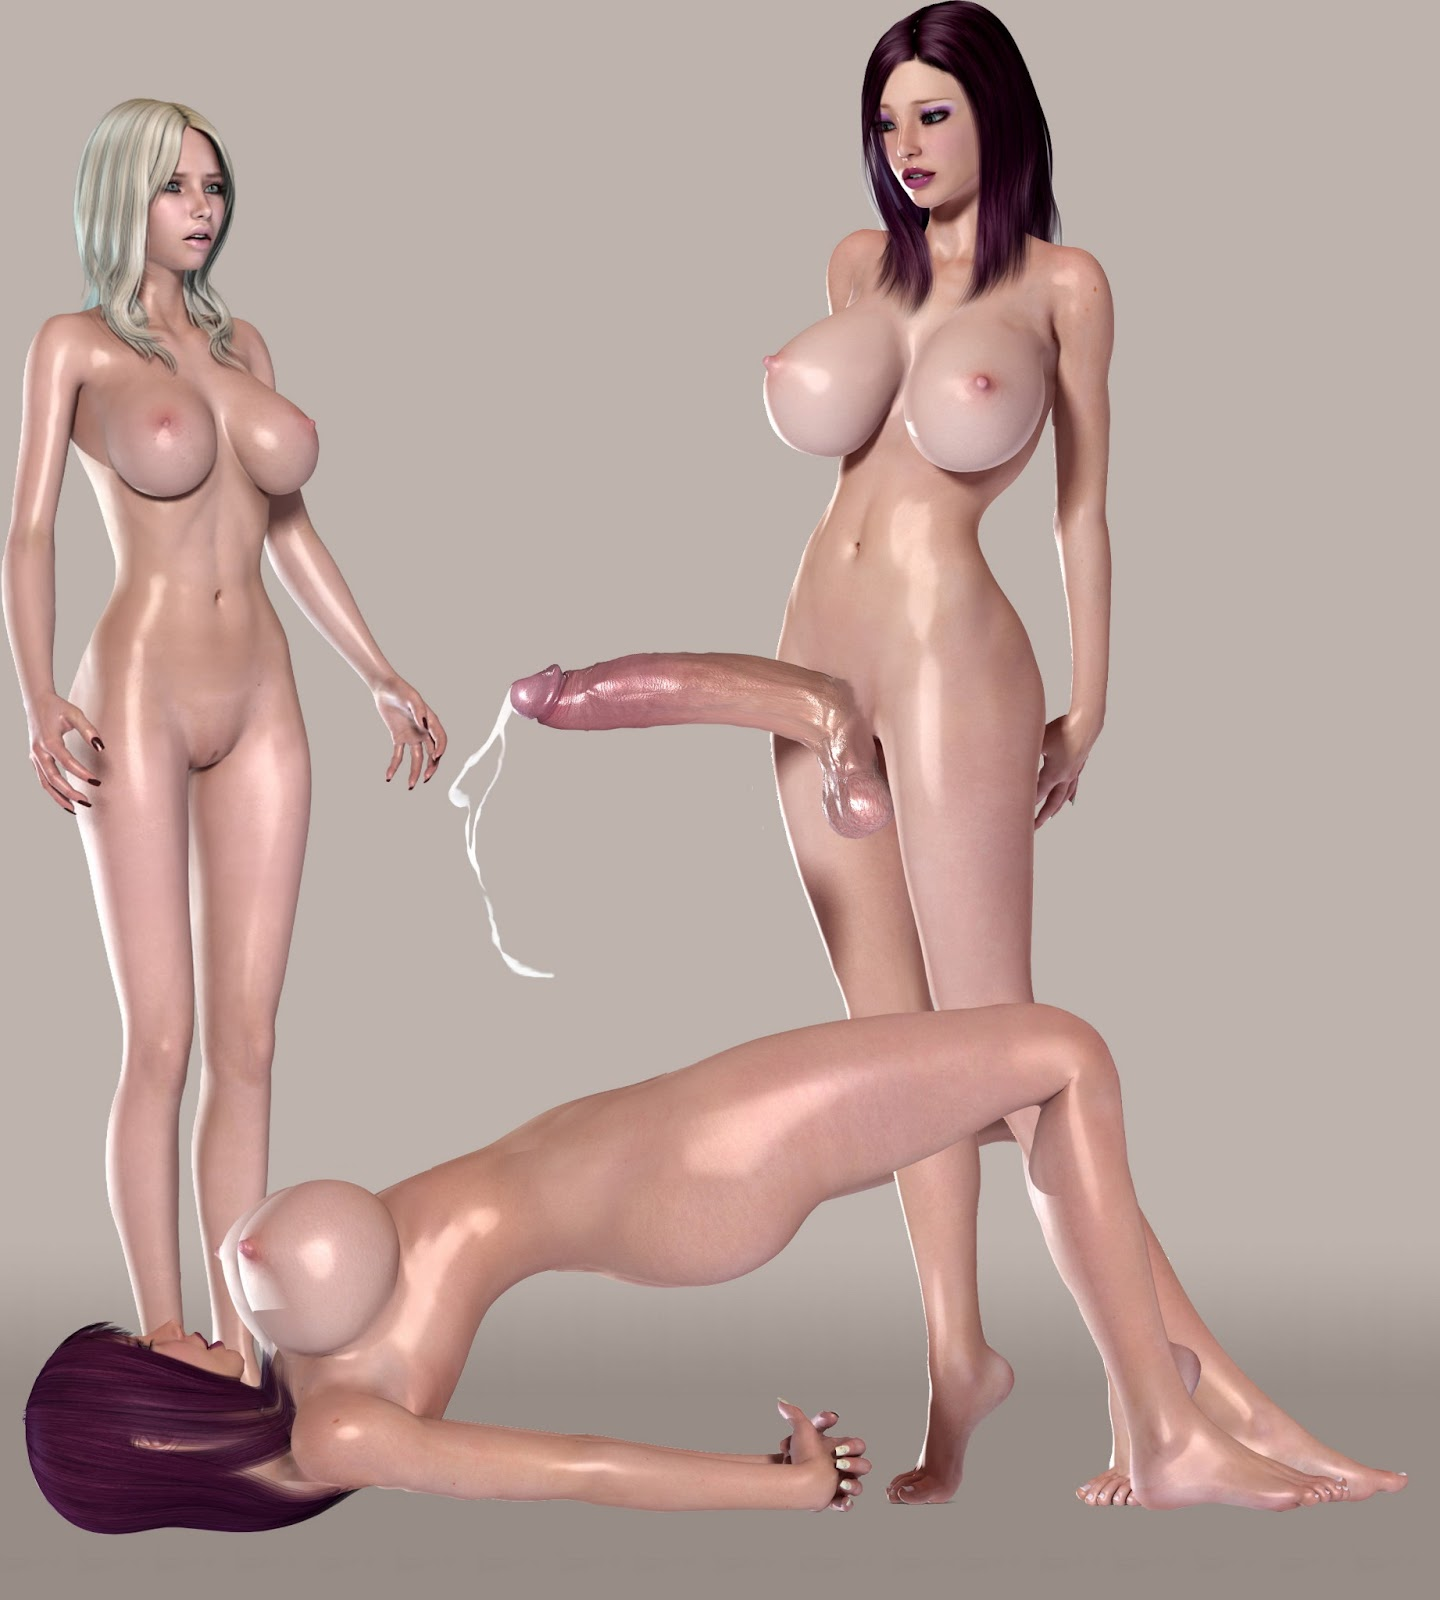 Sayako Fucks Ayako - Sex Porn Images